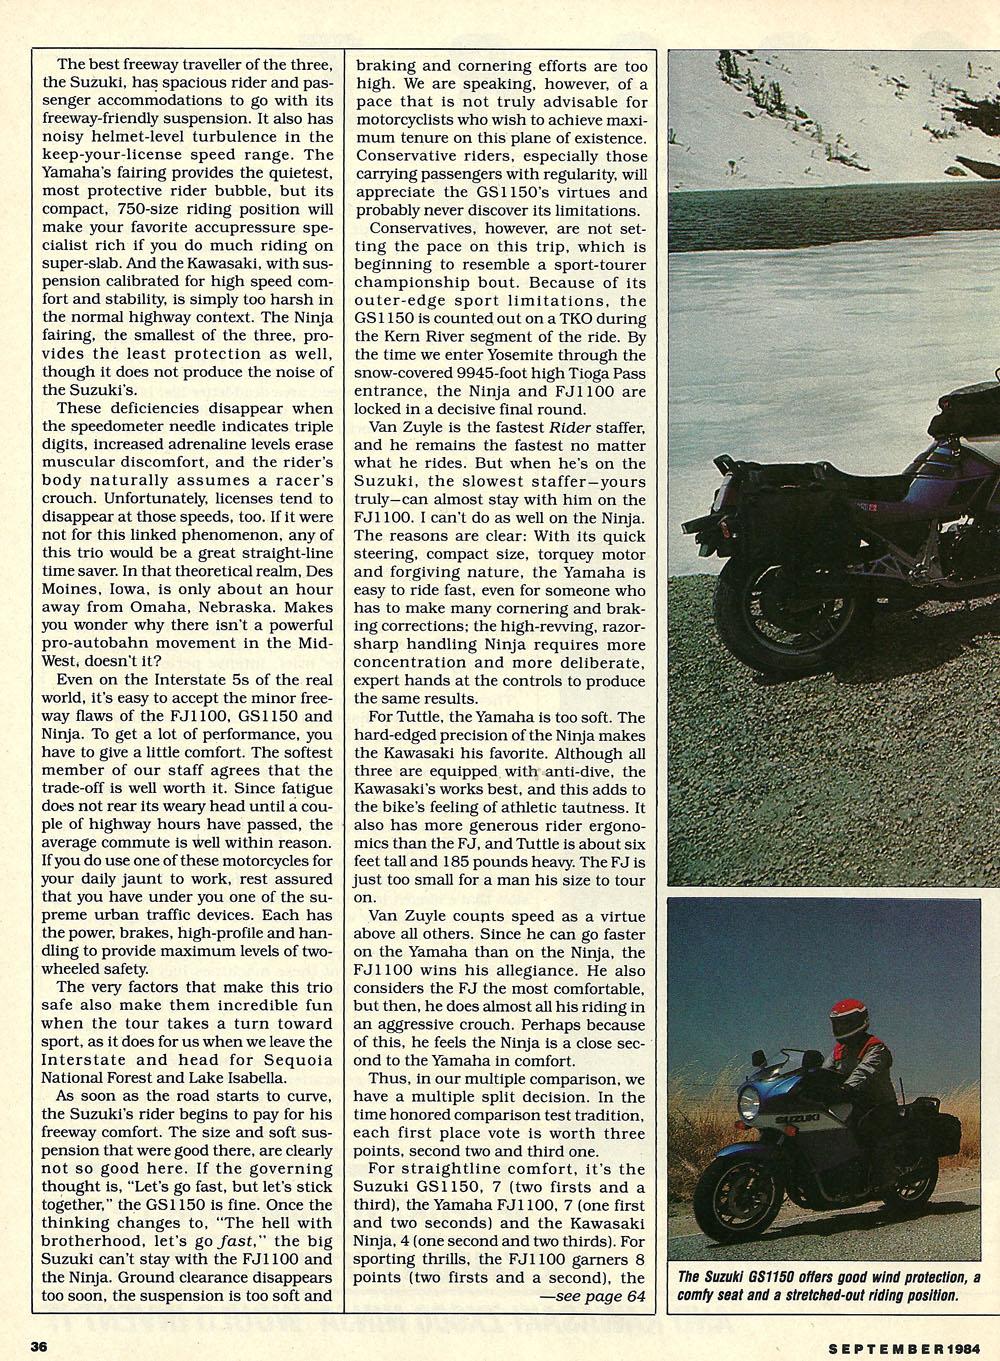 1984 fj1100 zx900 gs1150 road test 03.jpg